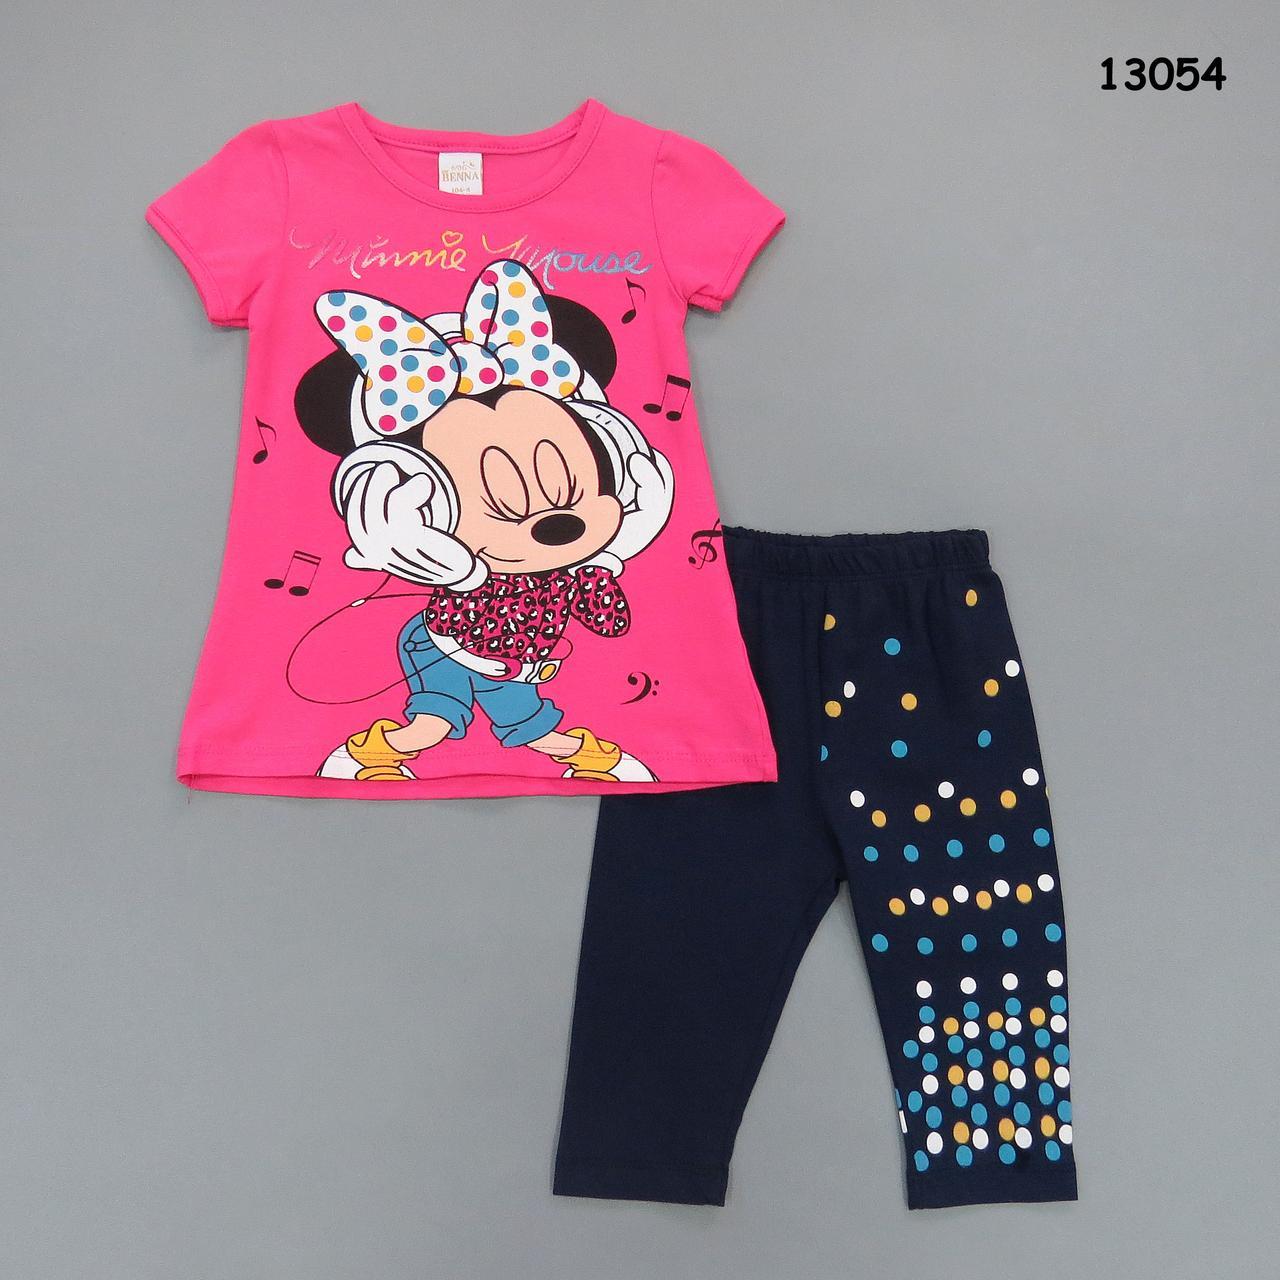 Летний костюм Minnie Mouse для девочки. Маломерит., фото 1